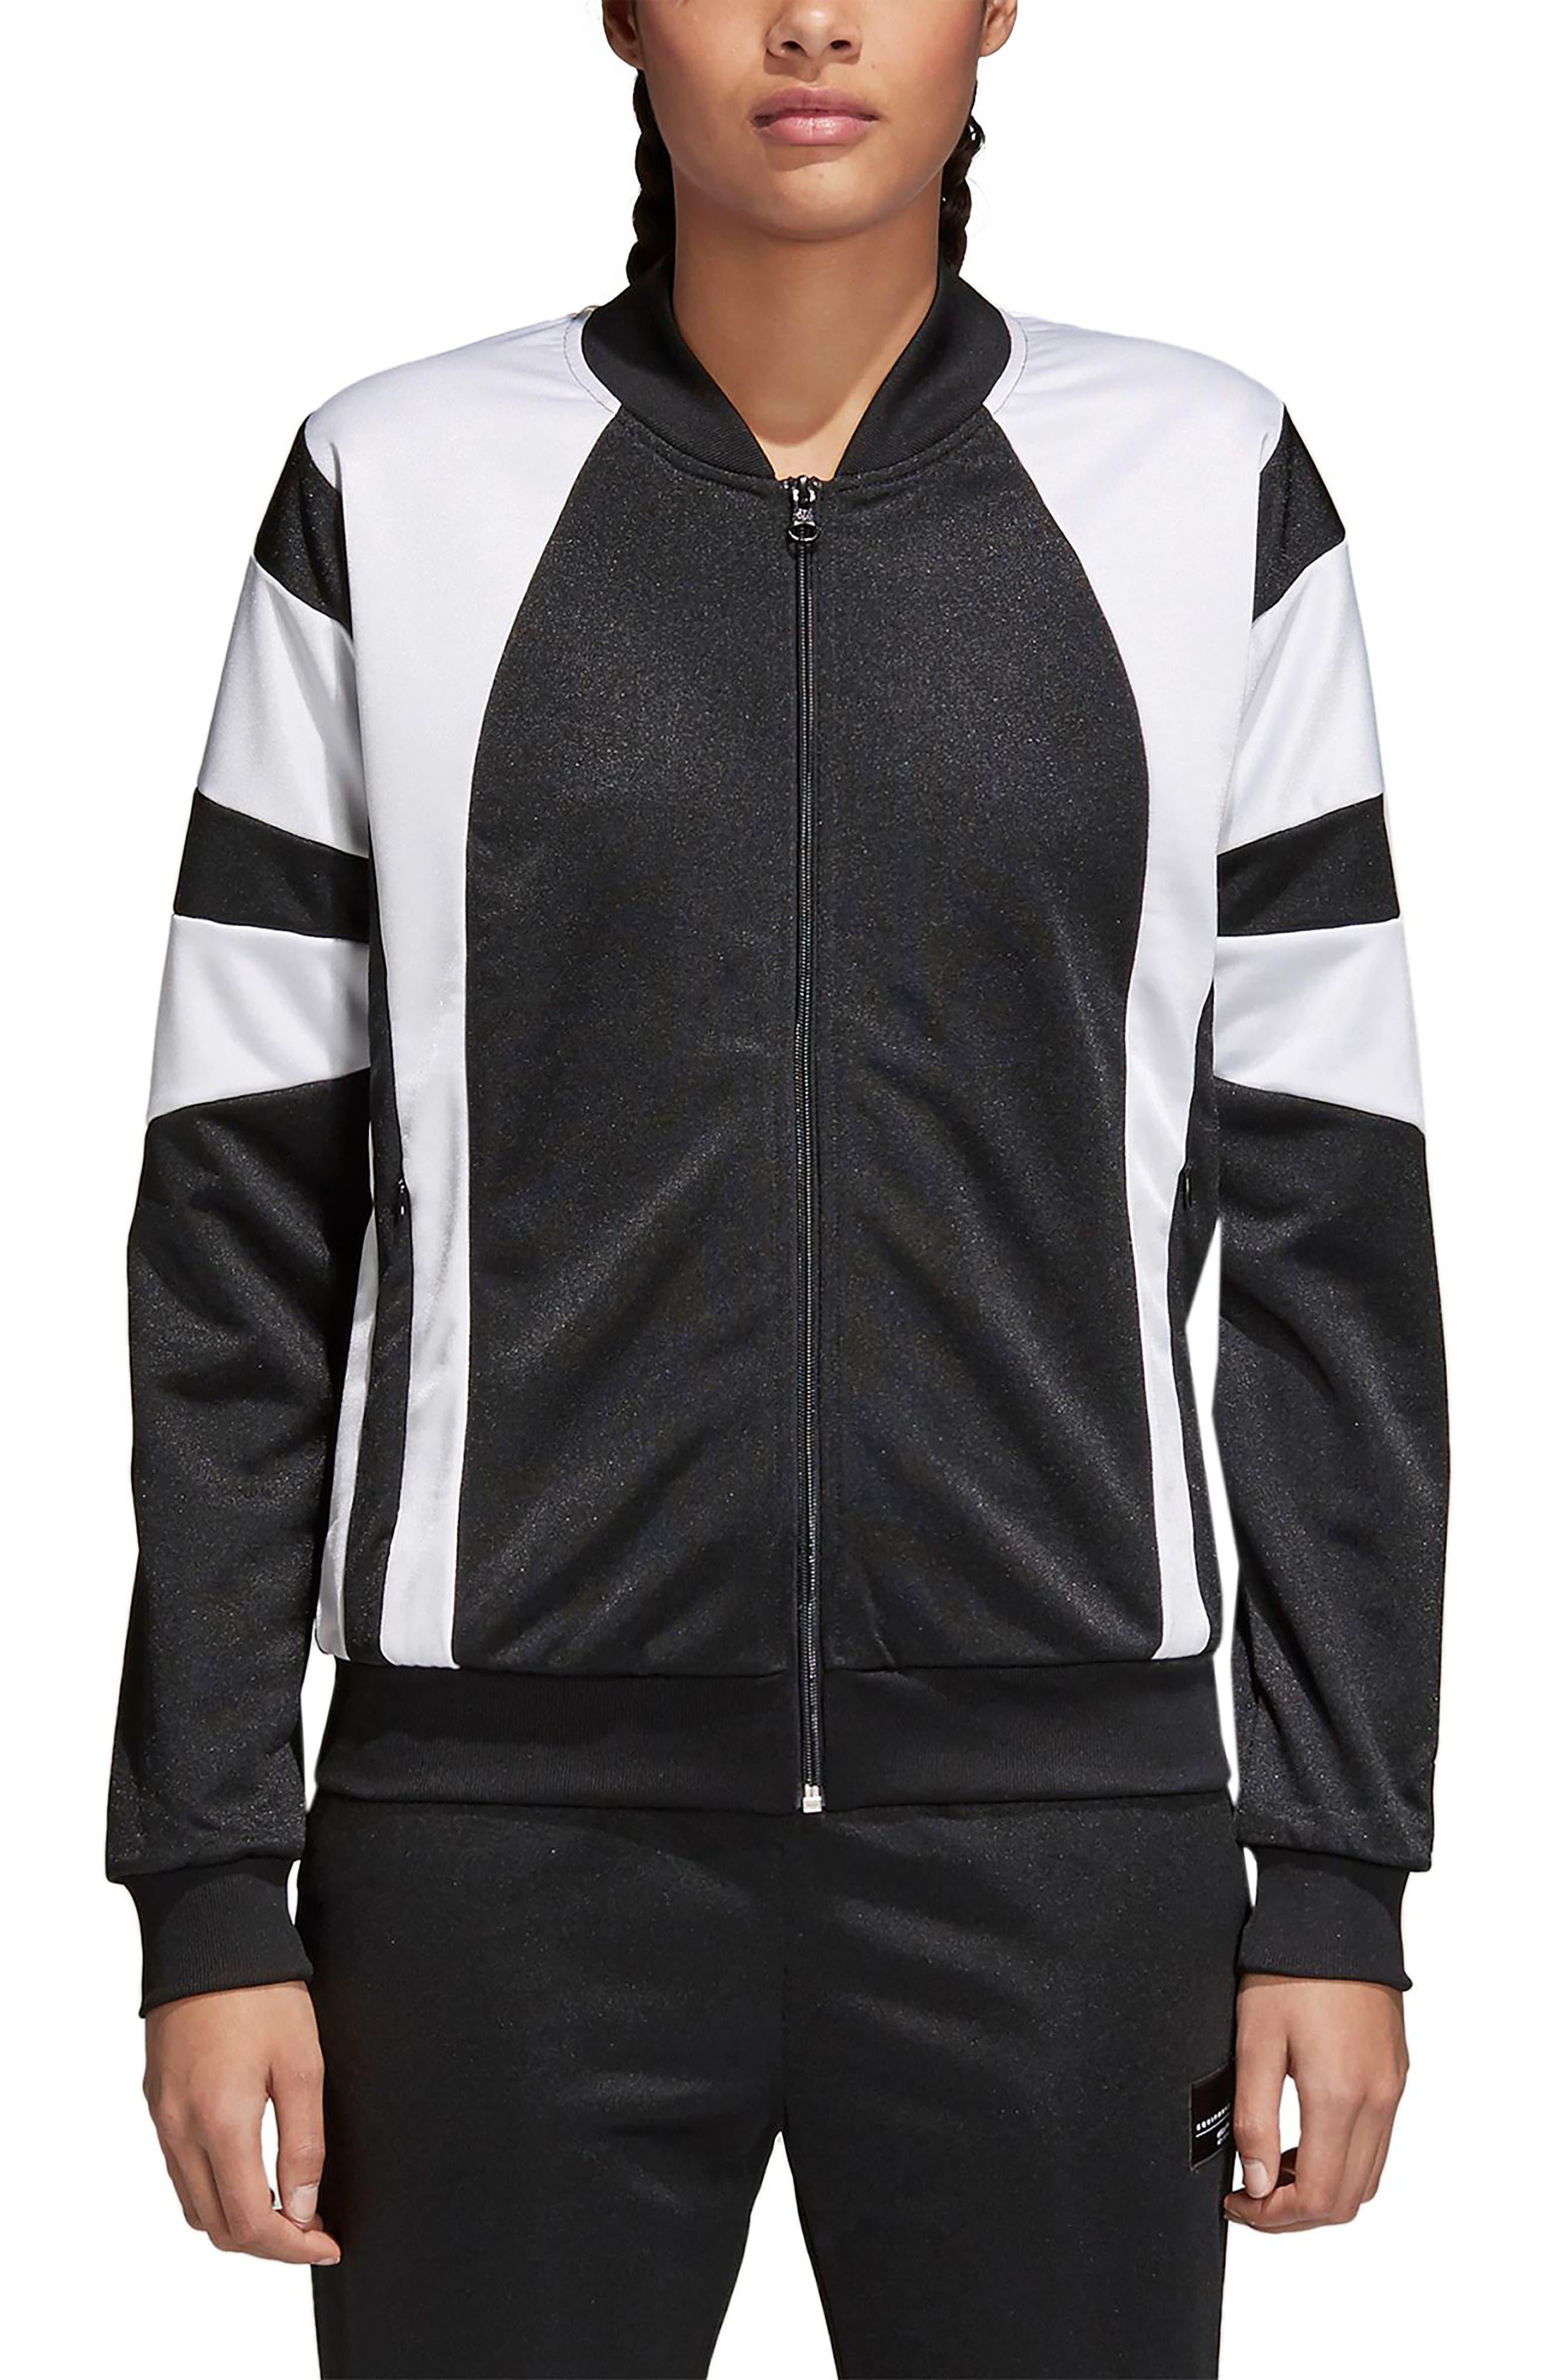 Originals Superstar Track Jacket,                             Main thumbnail 1, color,                             Black/ White